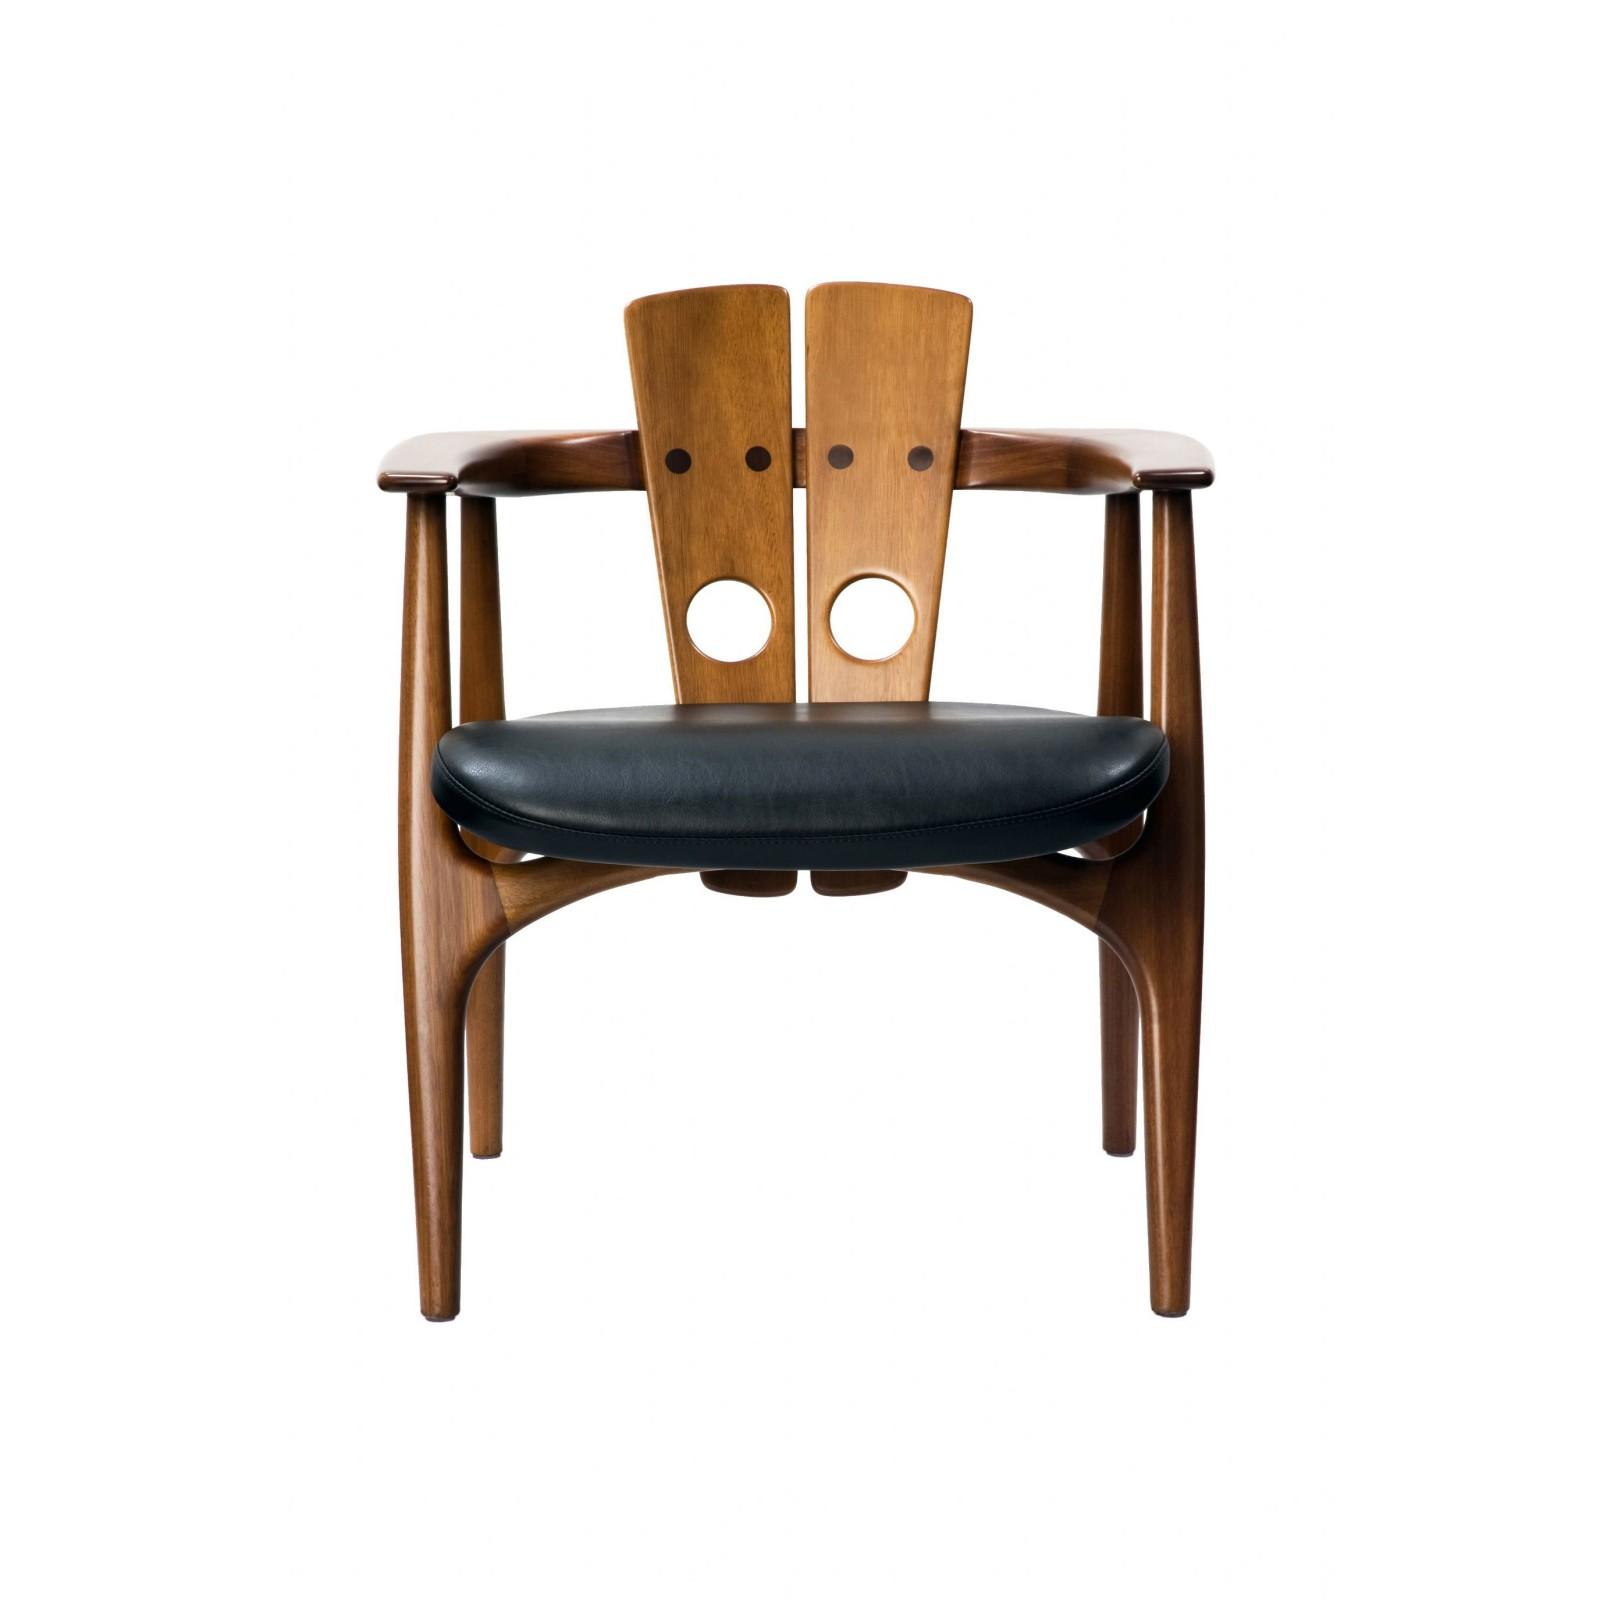 Katita Dining Chair By Sergio Rodrigues.  2701845c3ccfcad8094ac94daa168974_w2750_h2750.  2701845c3ccfcad8094ac94daa168974_w2750_h2750